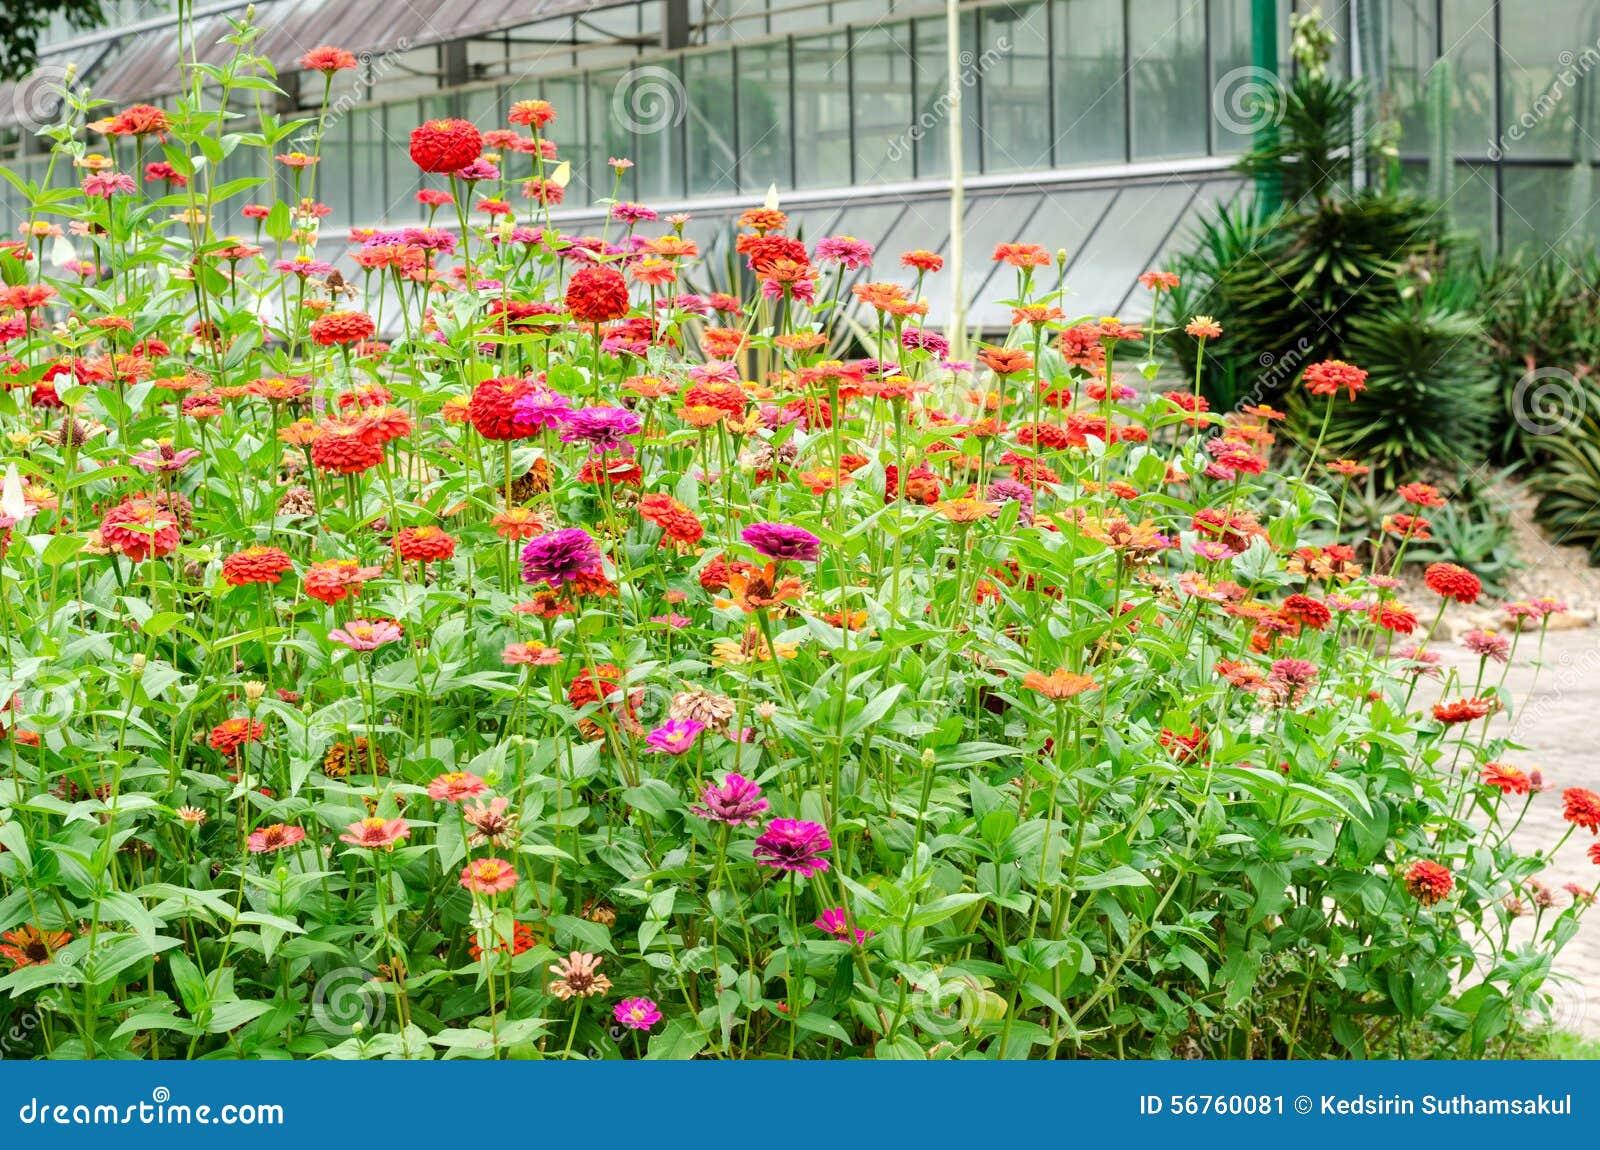 Natural Flower Garden : Beautiful of colorful zinnia flower in natural garden park